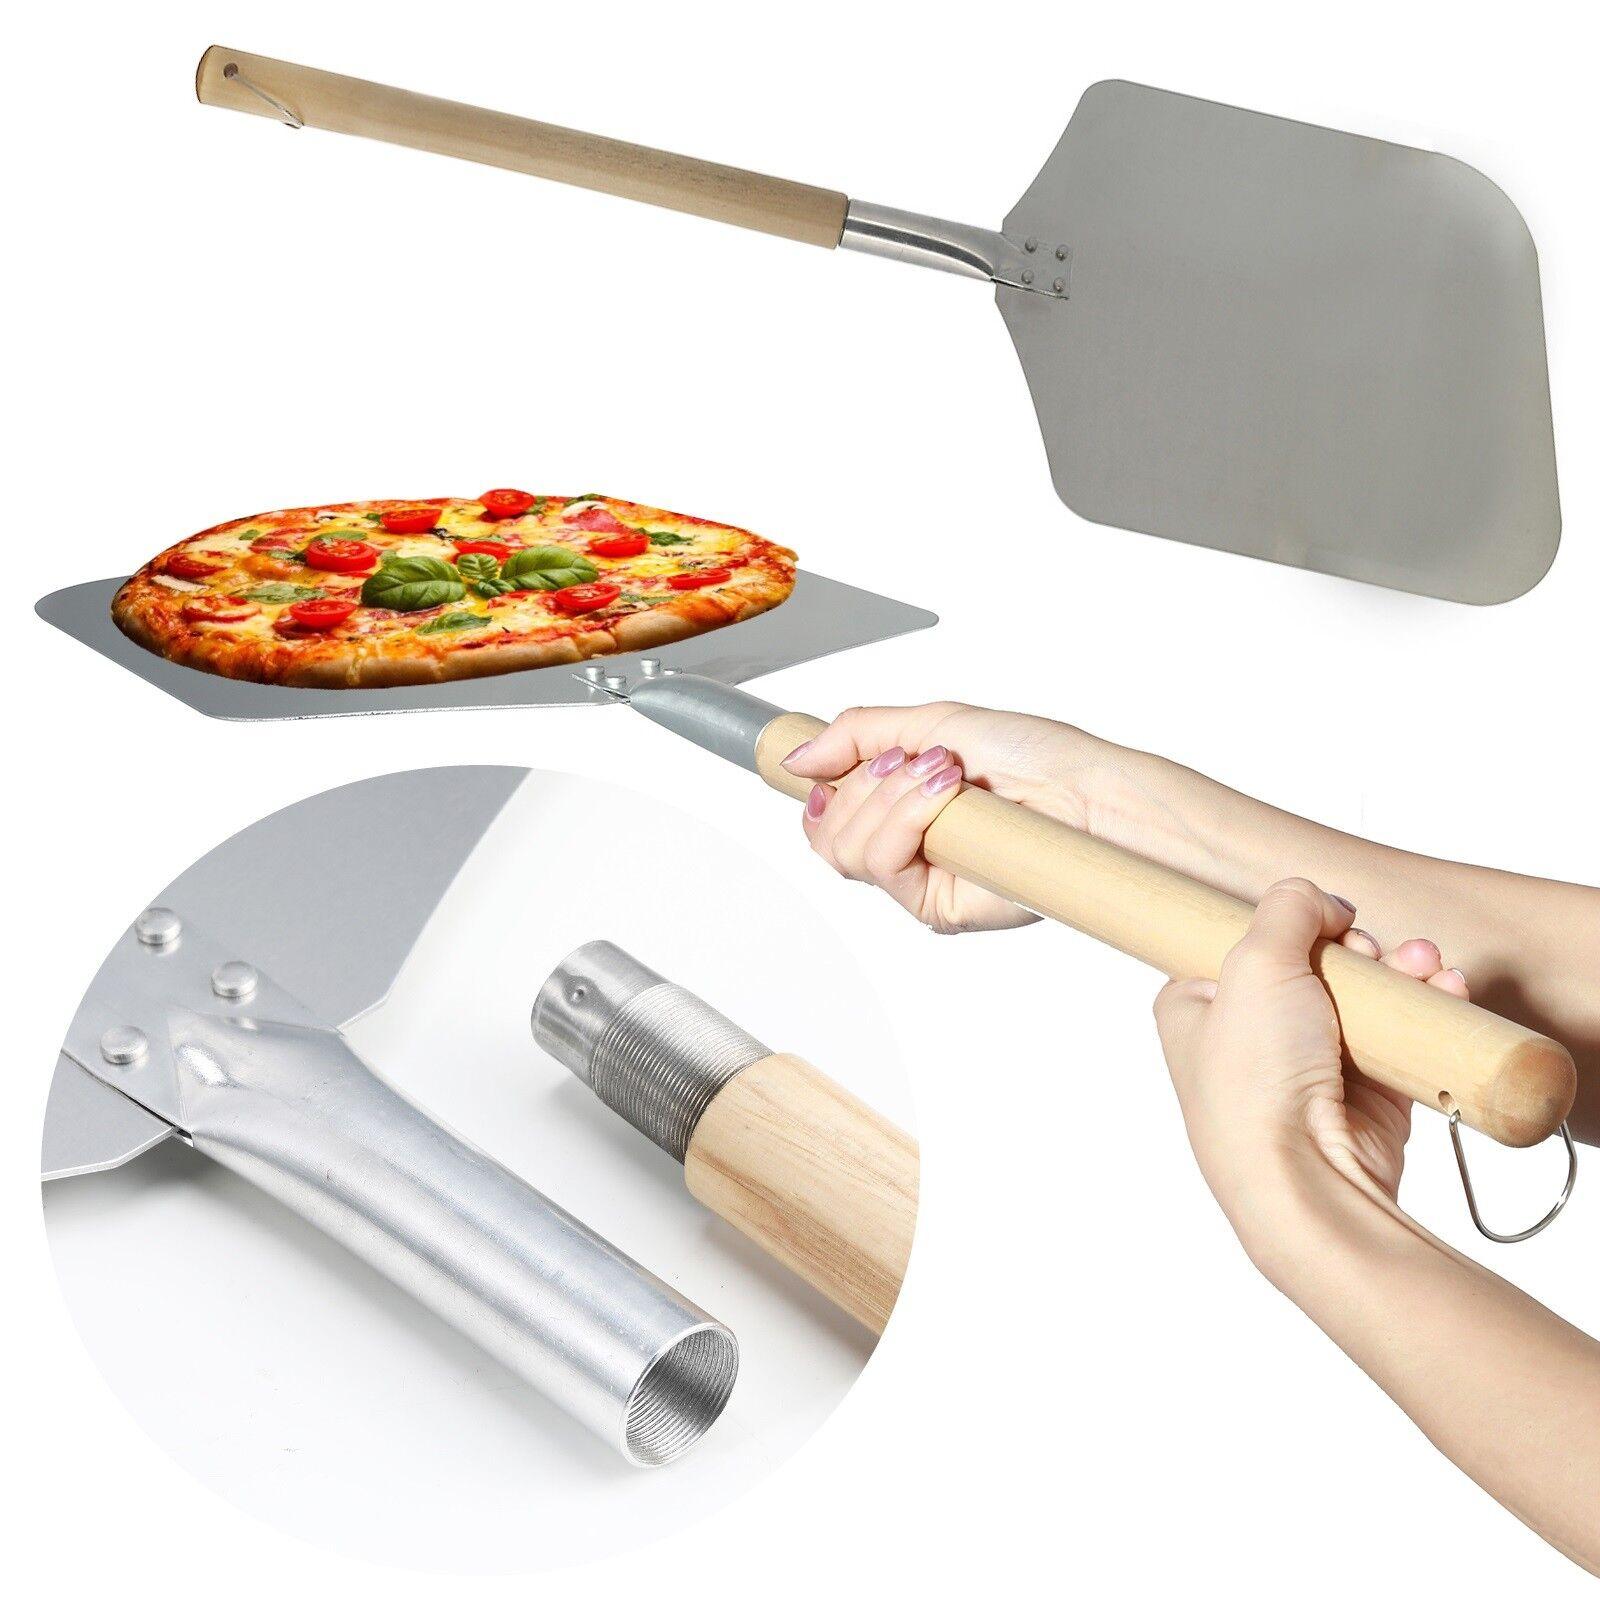 Pizza Schaufel 85 cm Heber Schieber Alu 35 x 30 cm Brot Backen Ofen Grill Griff